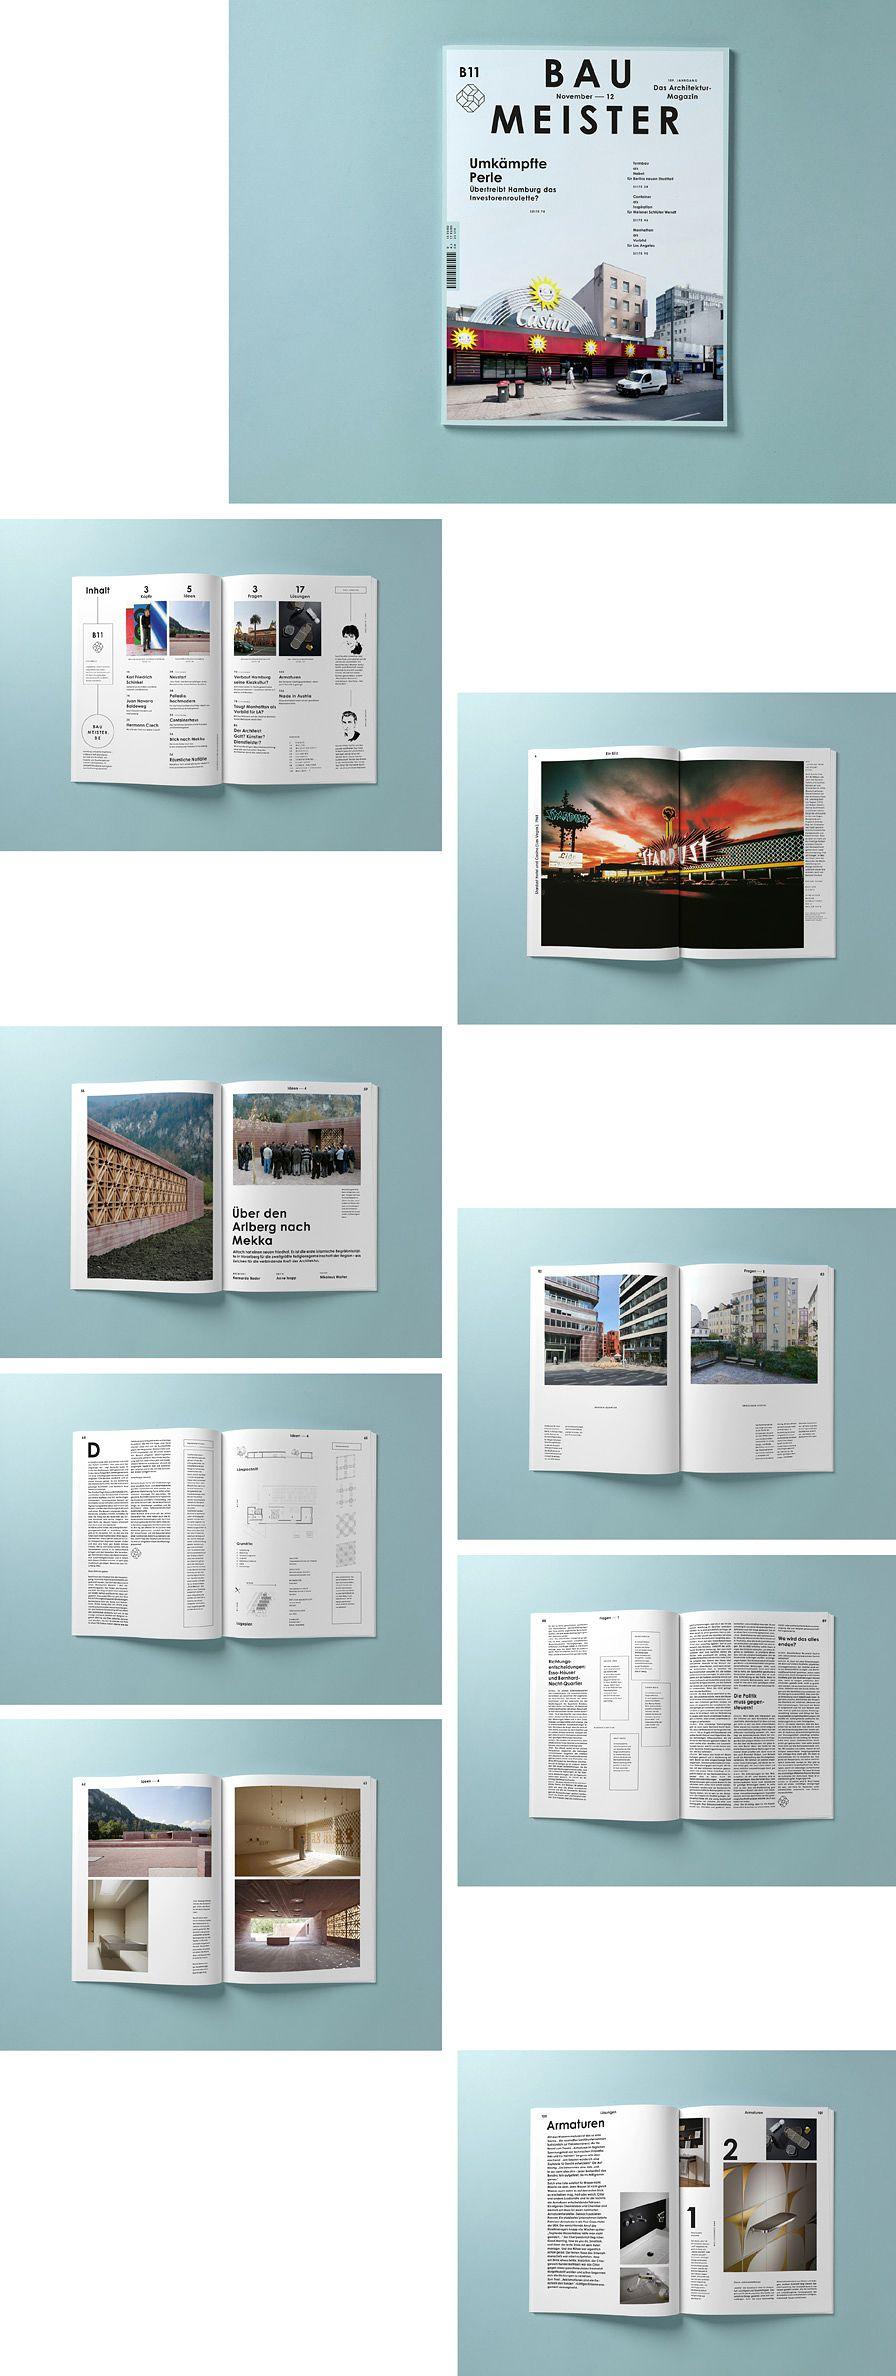 BAU MEISTER   éditorial   Pinterest   Editorial, Diseño editorial y ...